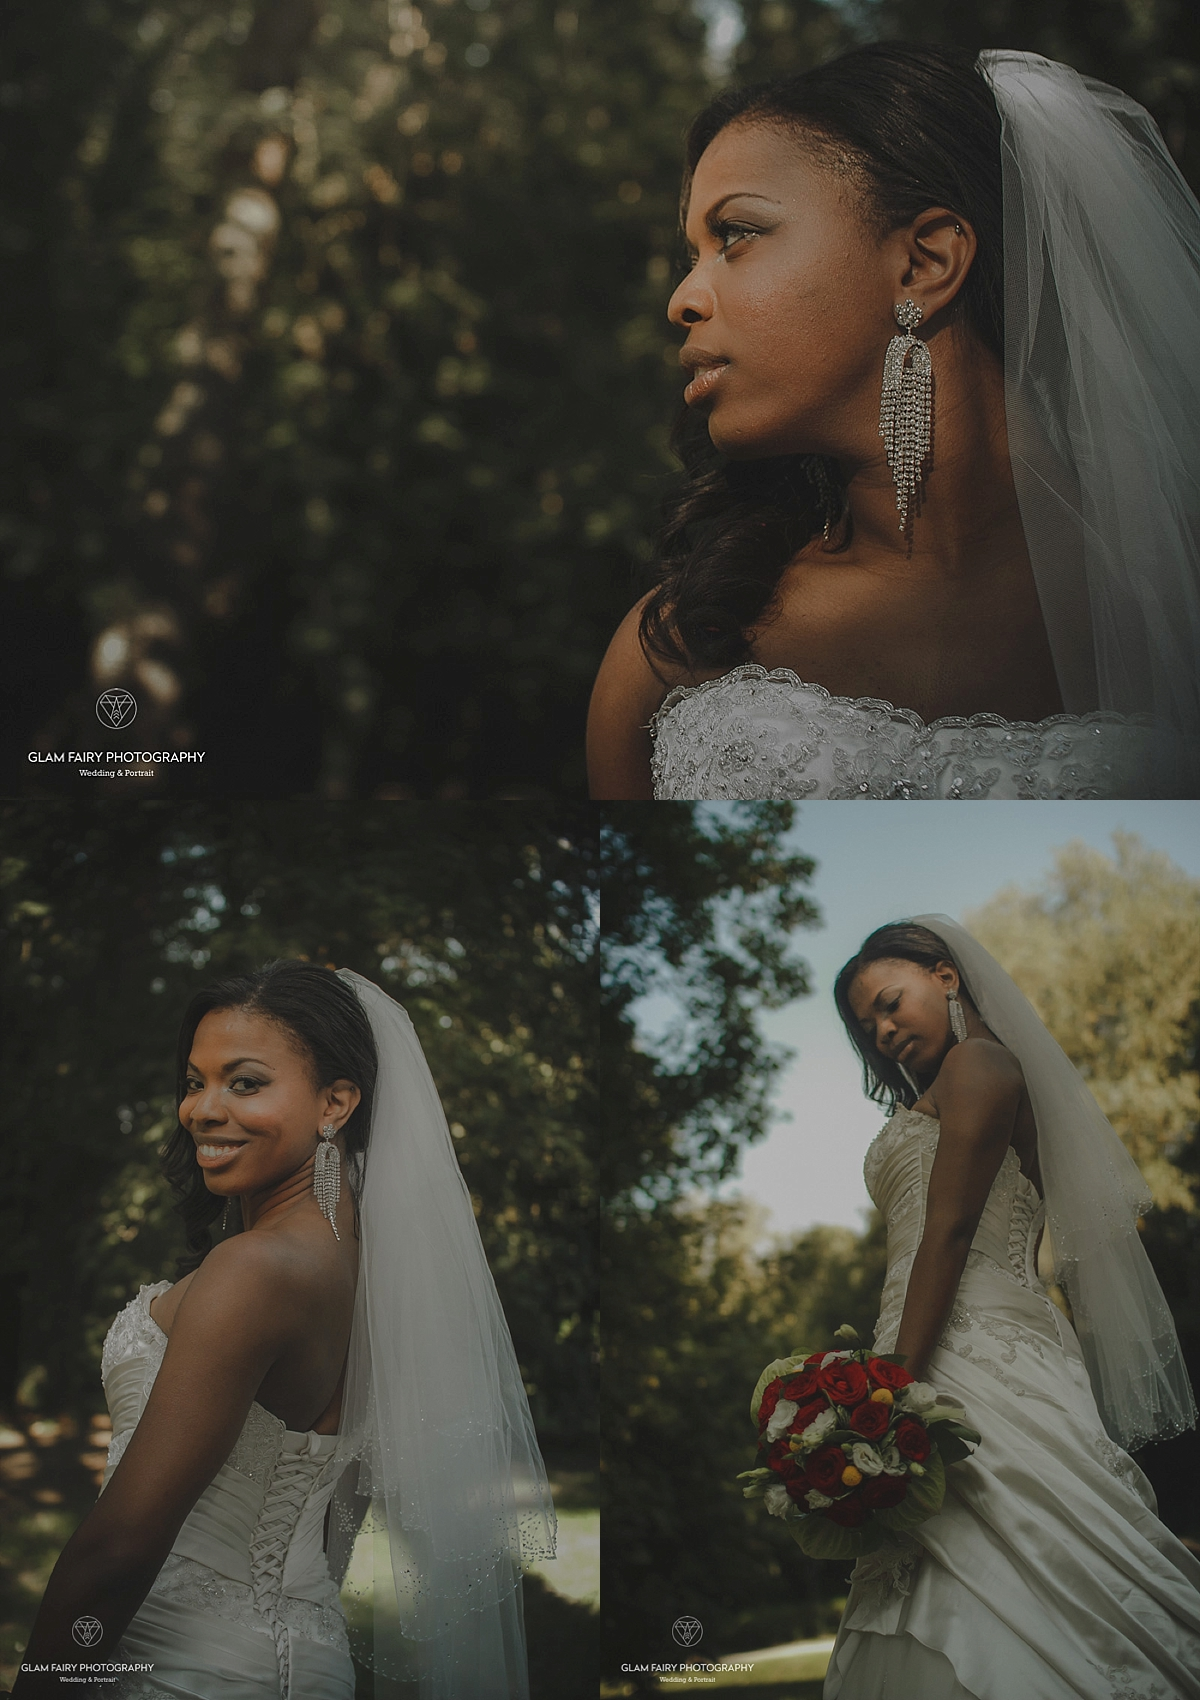 GlamFairyPhotography-mariage-afro-antillais-orsay-candy_0026